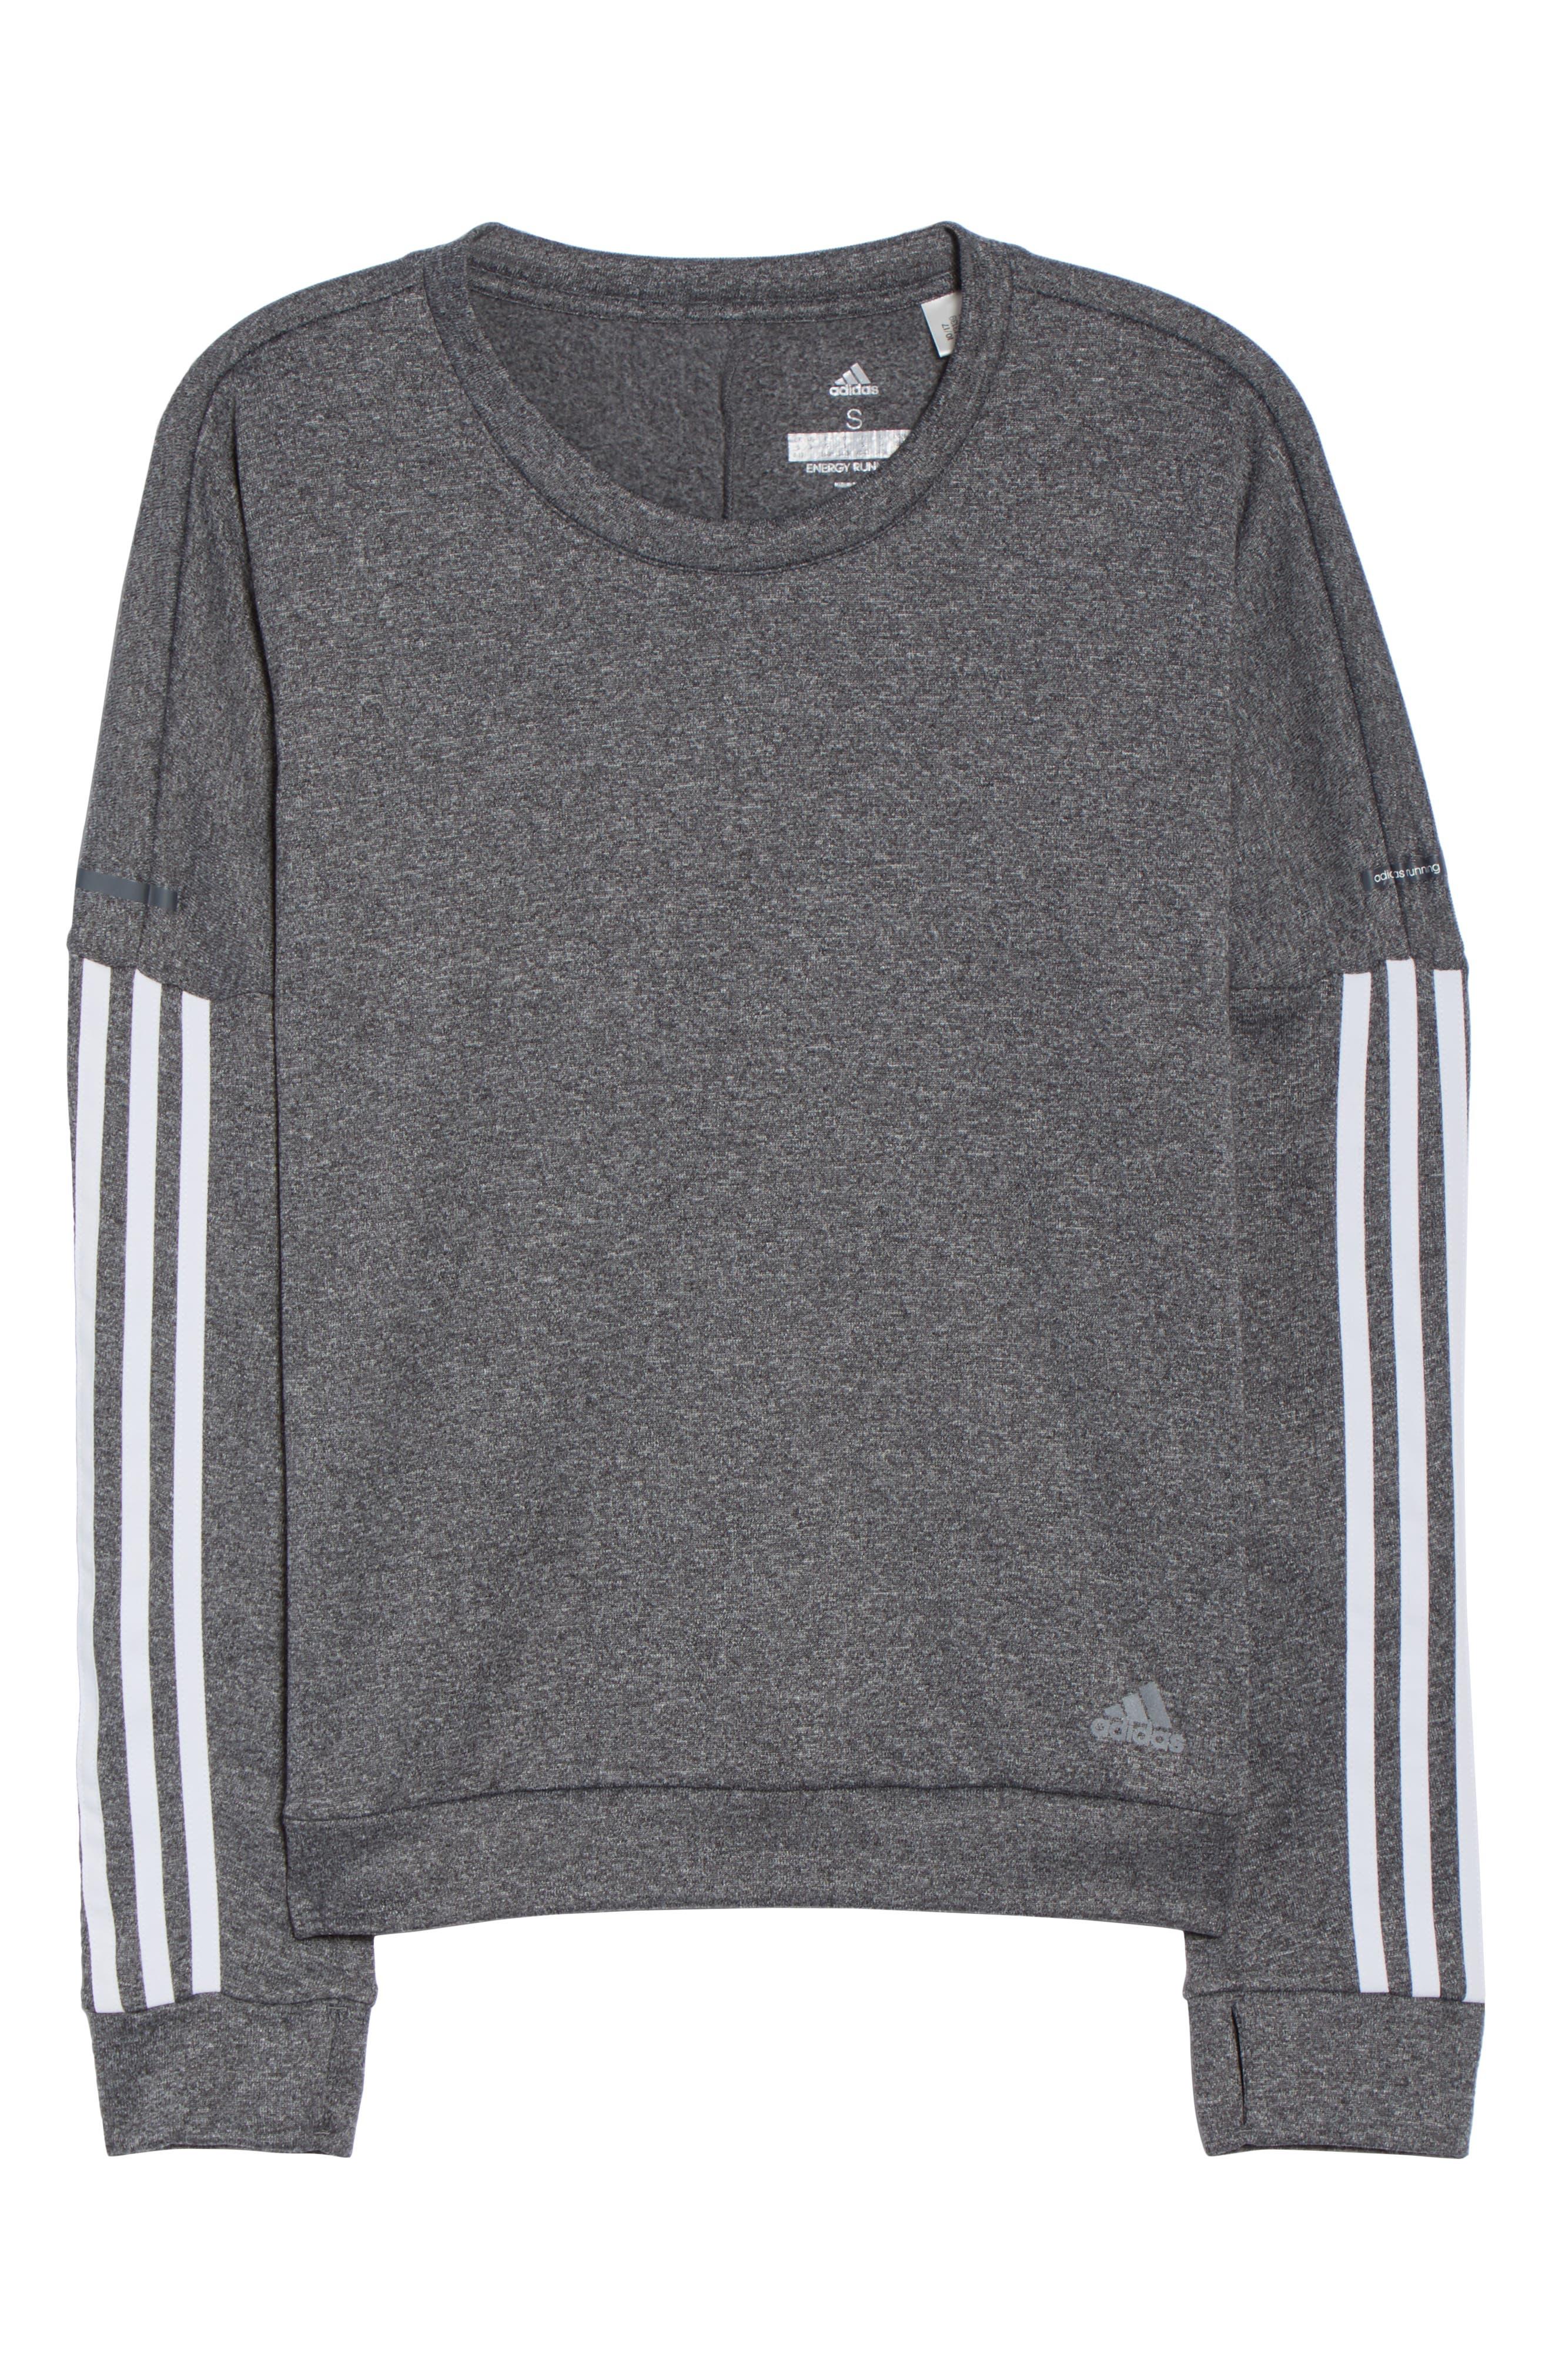 3-Stripes Running Sweatshirt,                             Alternate thumbnail 7, color,                             DARK GREY HEATHER